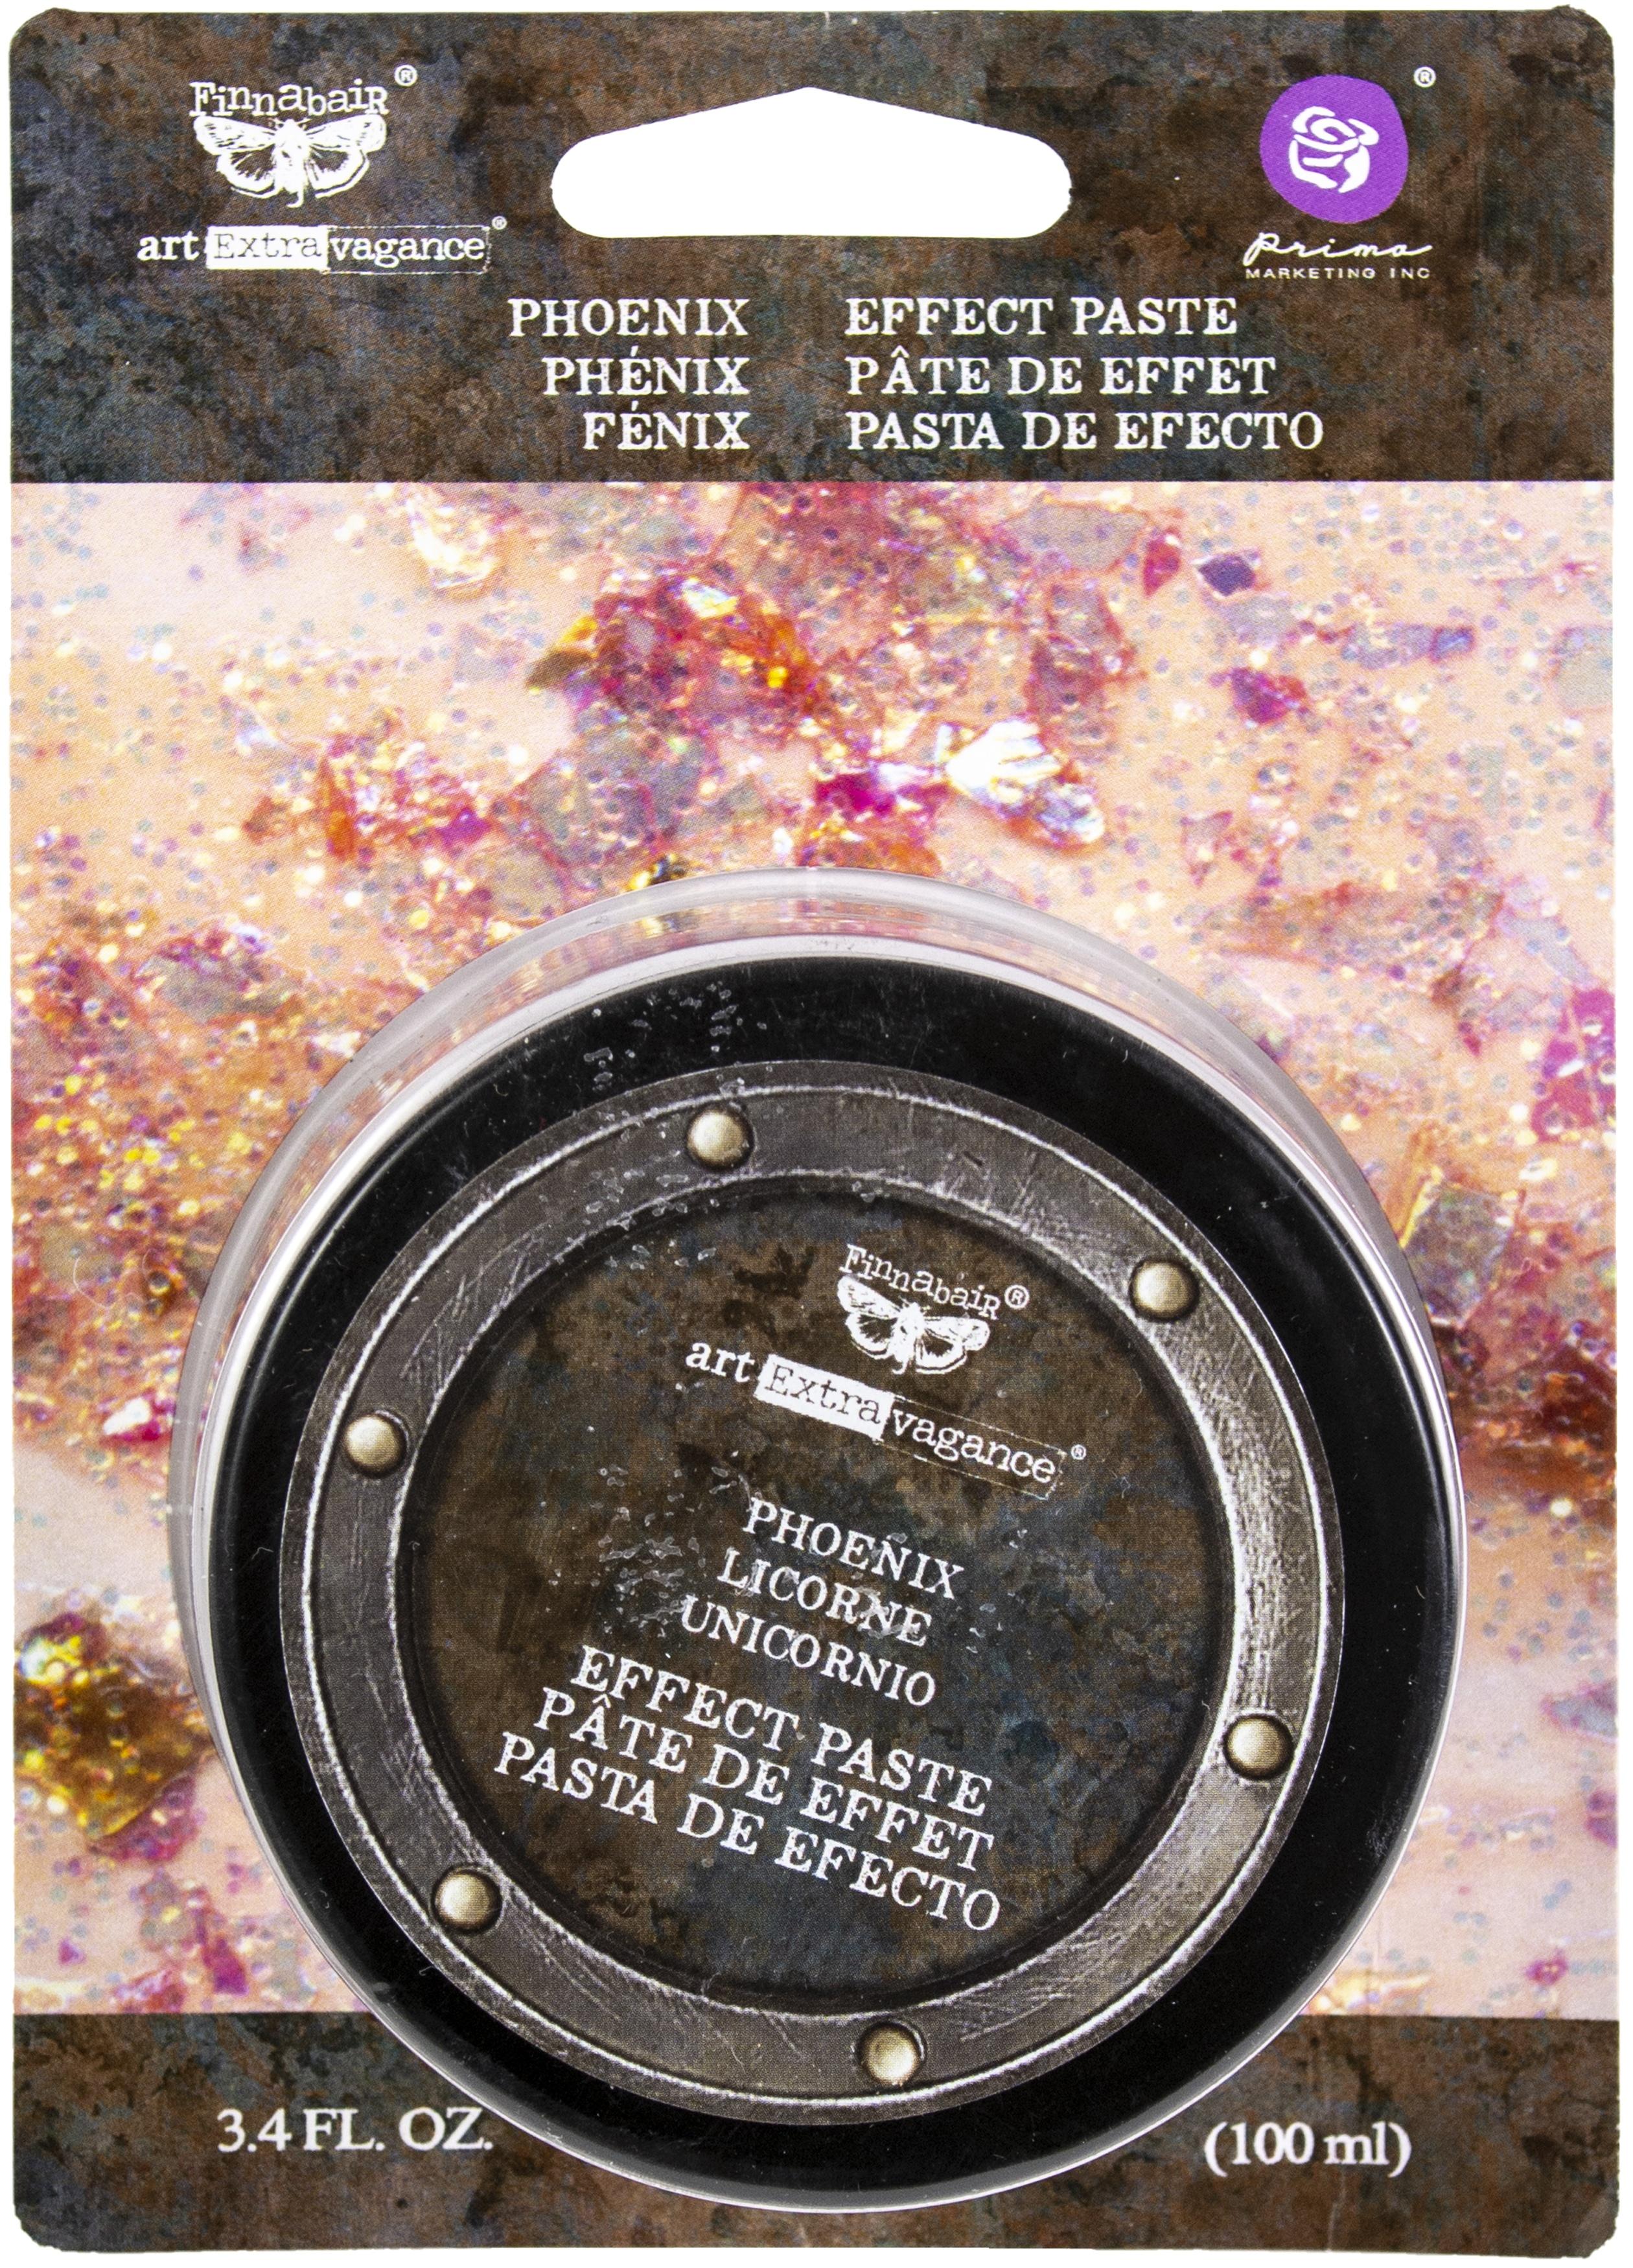 Finnabair Art Extravagance Effect Paste 100ml Jar-Phoenix